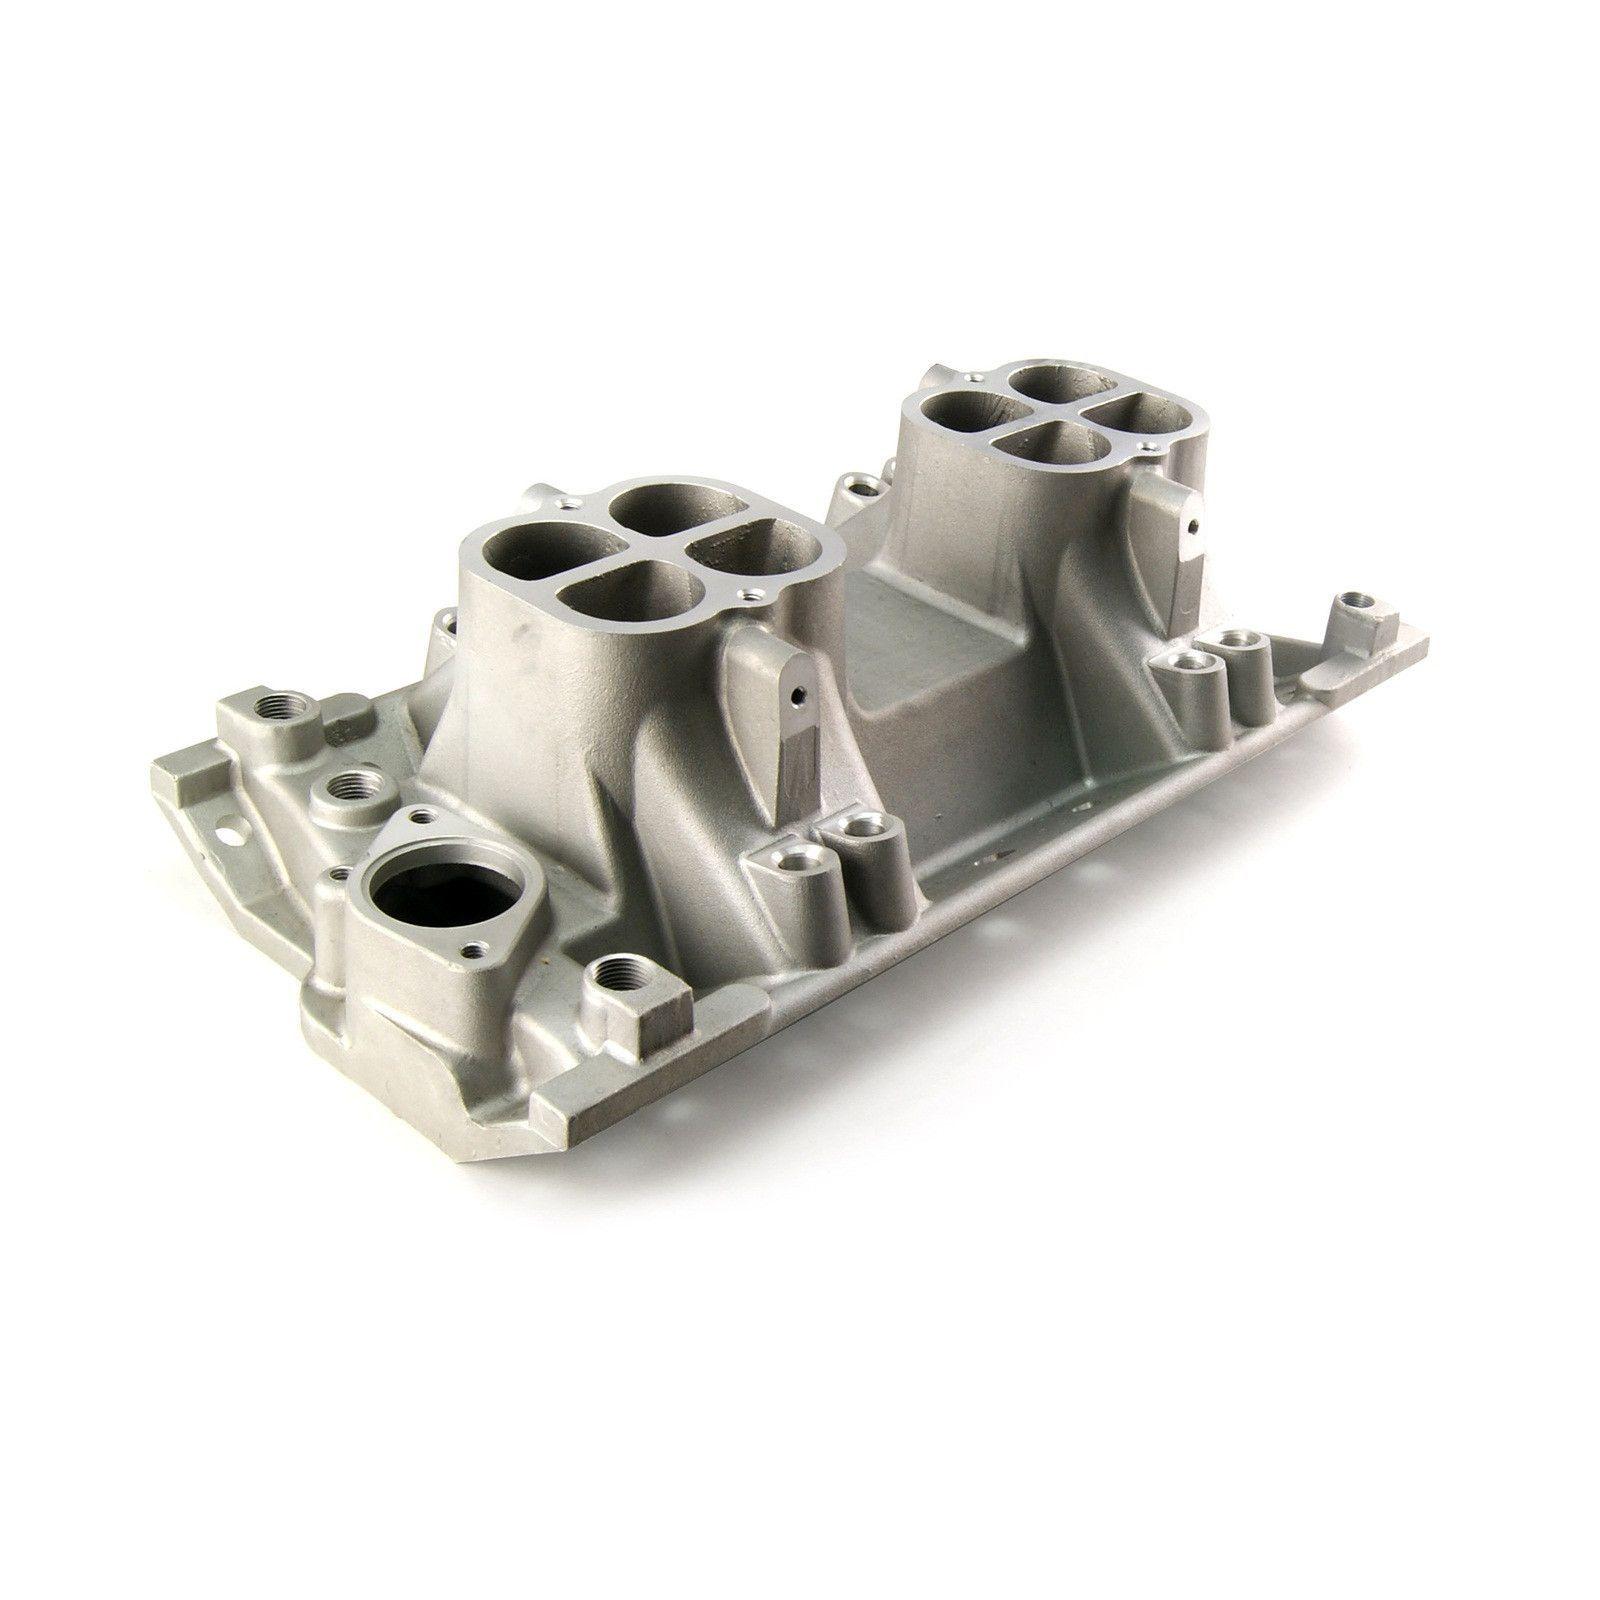 Chevy SBC 350 TPI EFI Vortec Ram Air Lower Intake Manifold